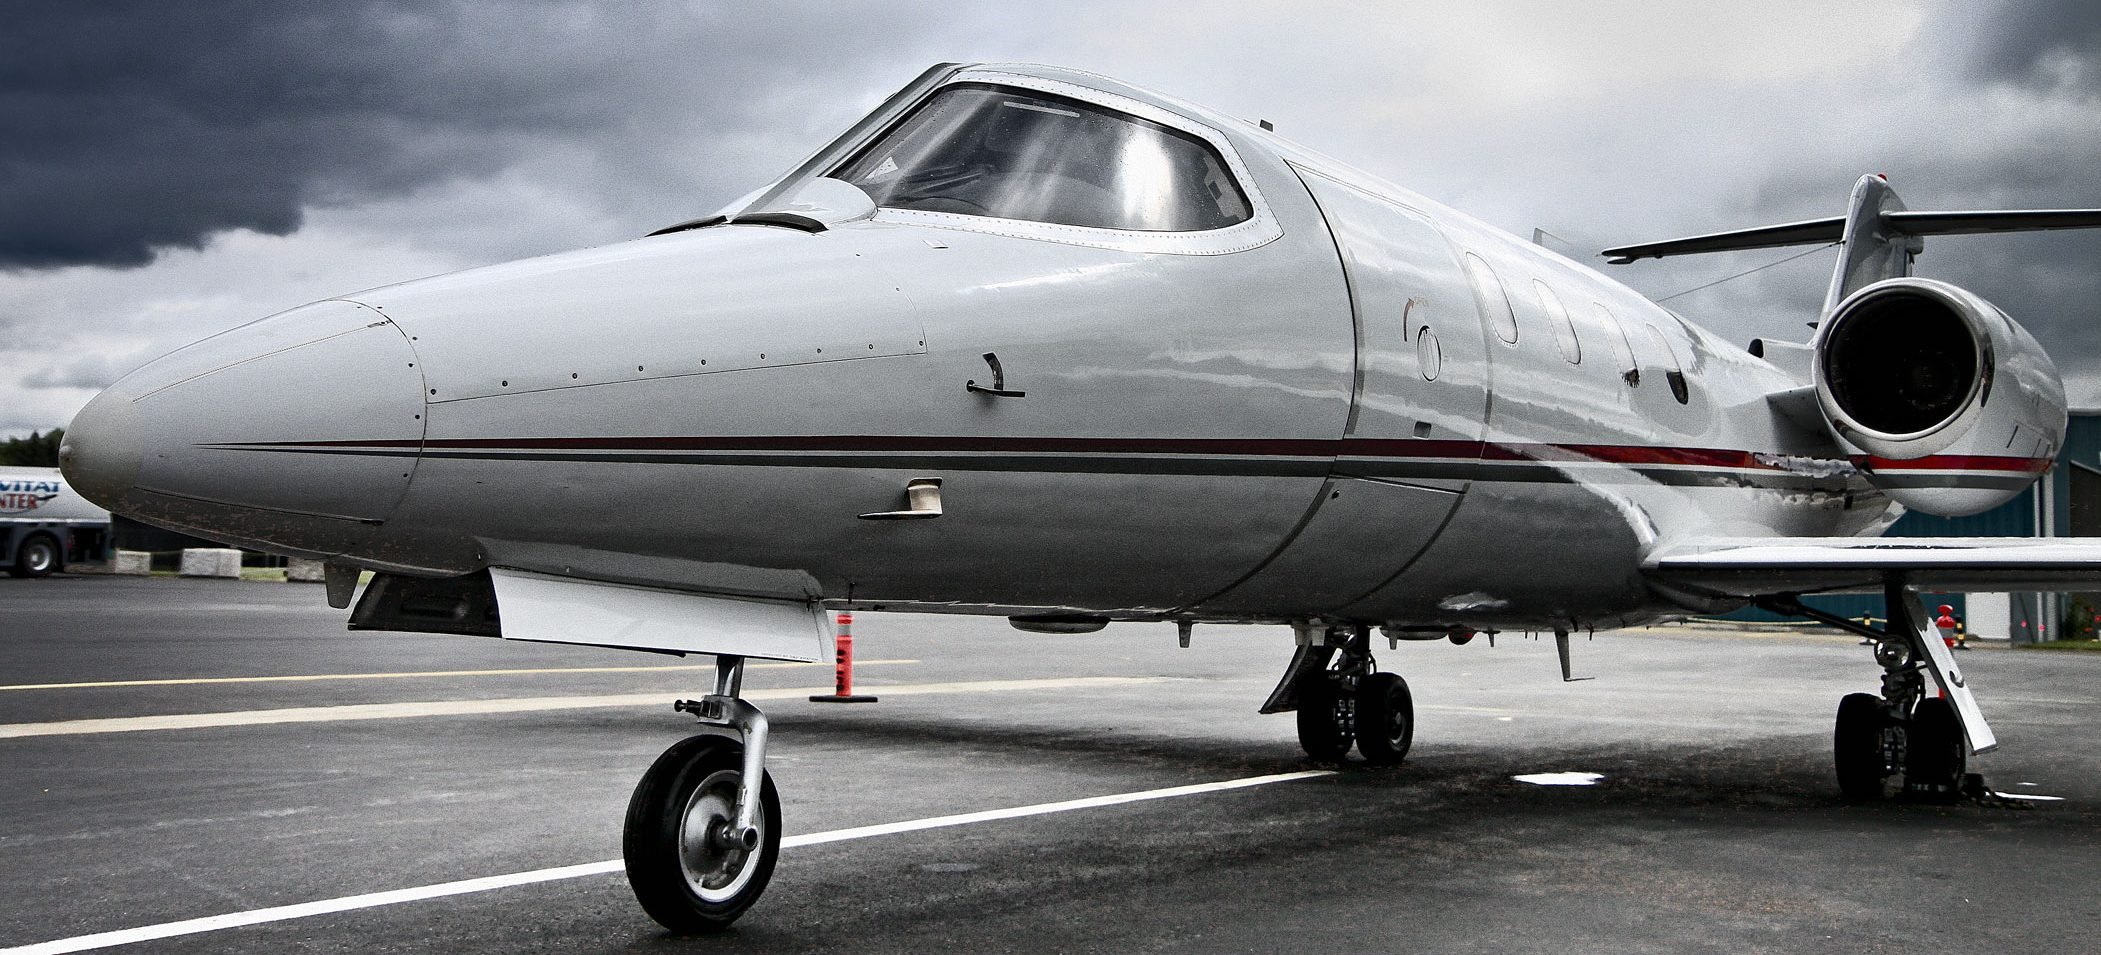 Lear jet. (Flickr image by stuart.mike)